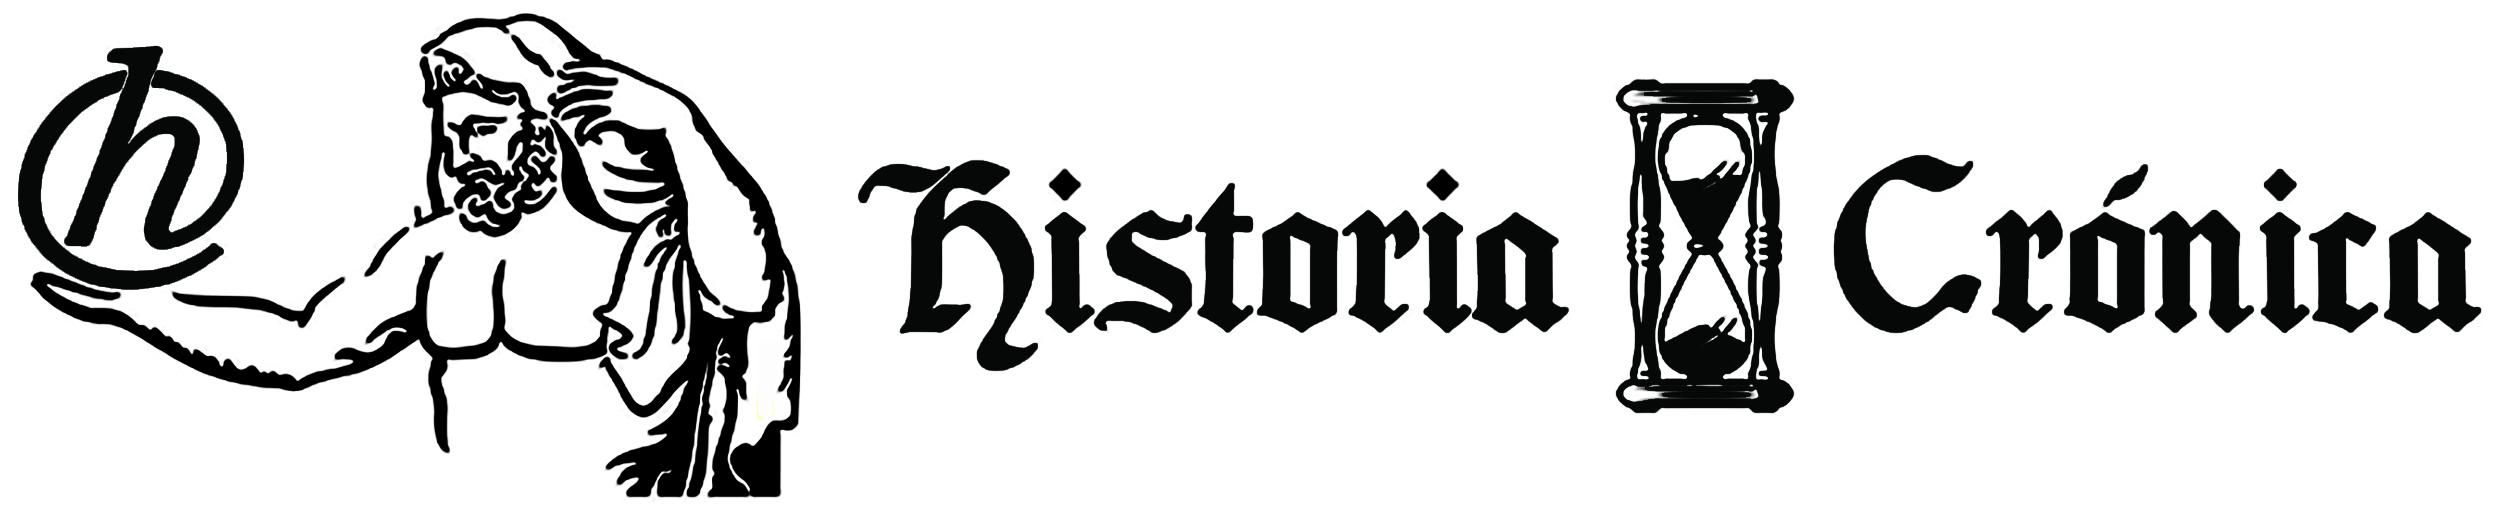 Historiadores